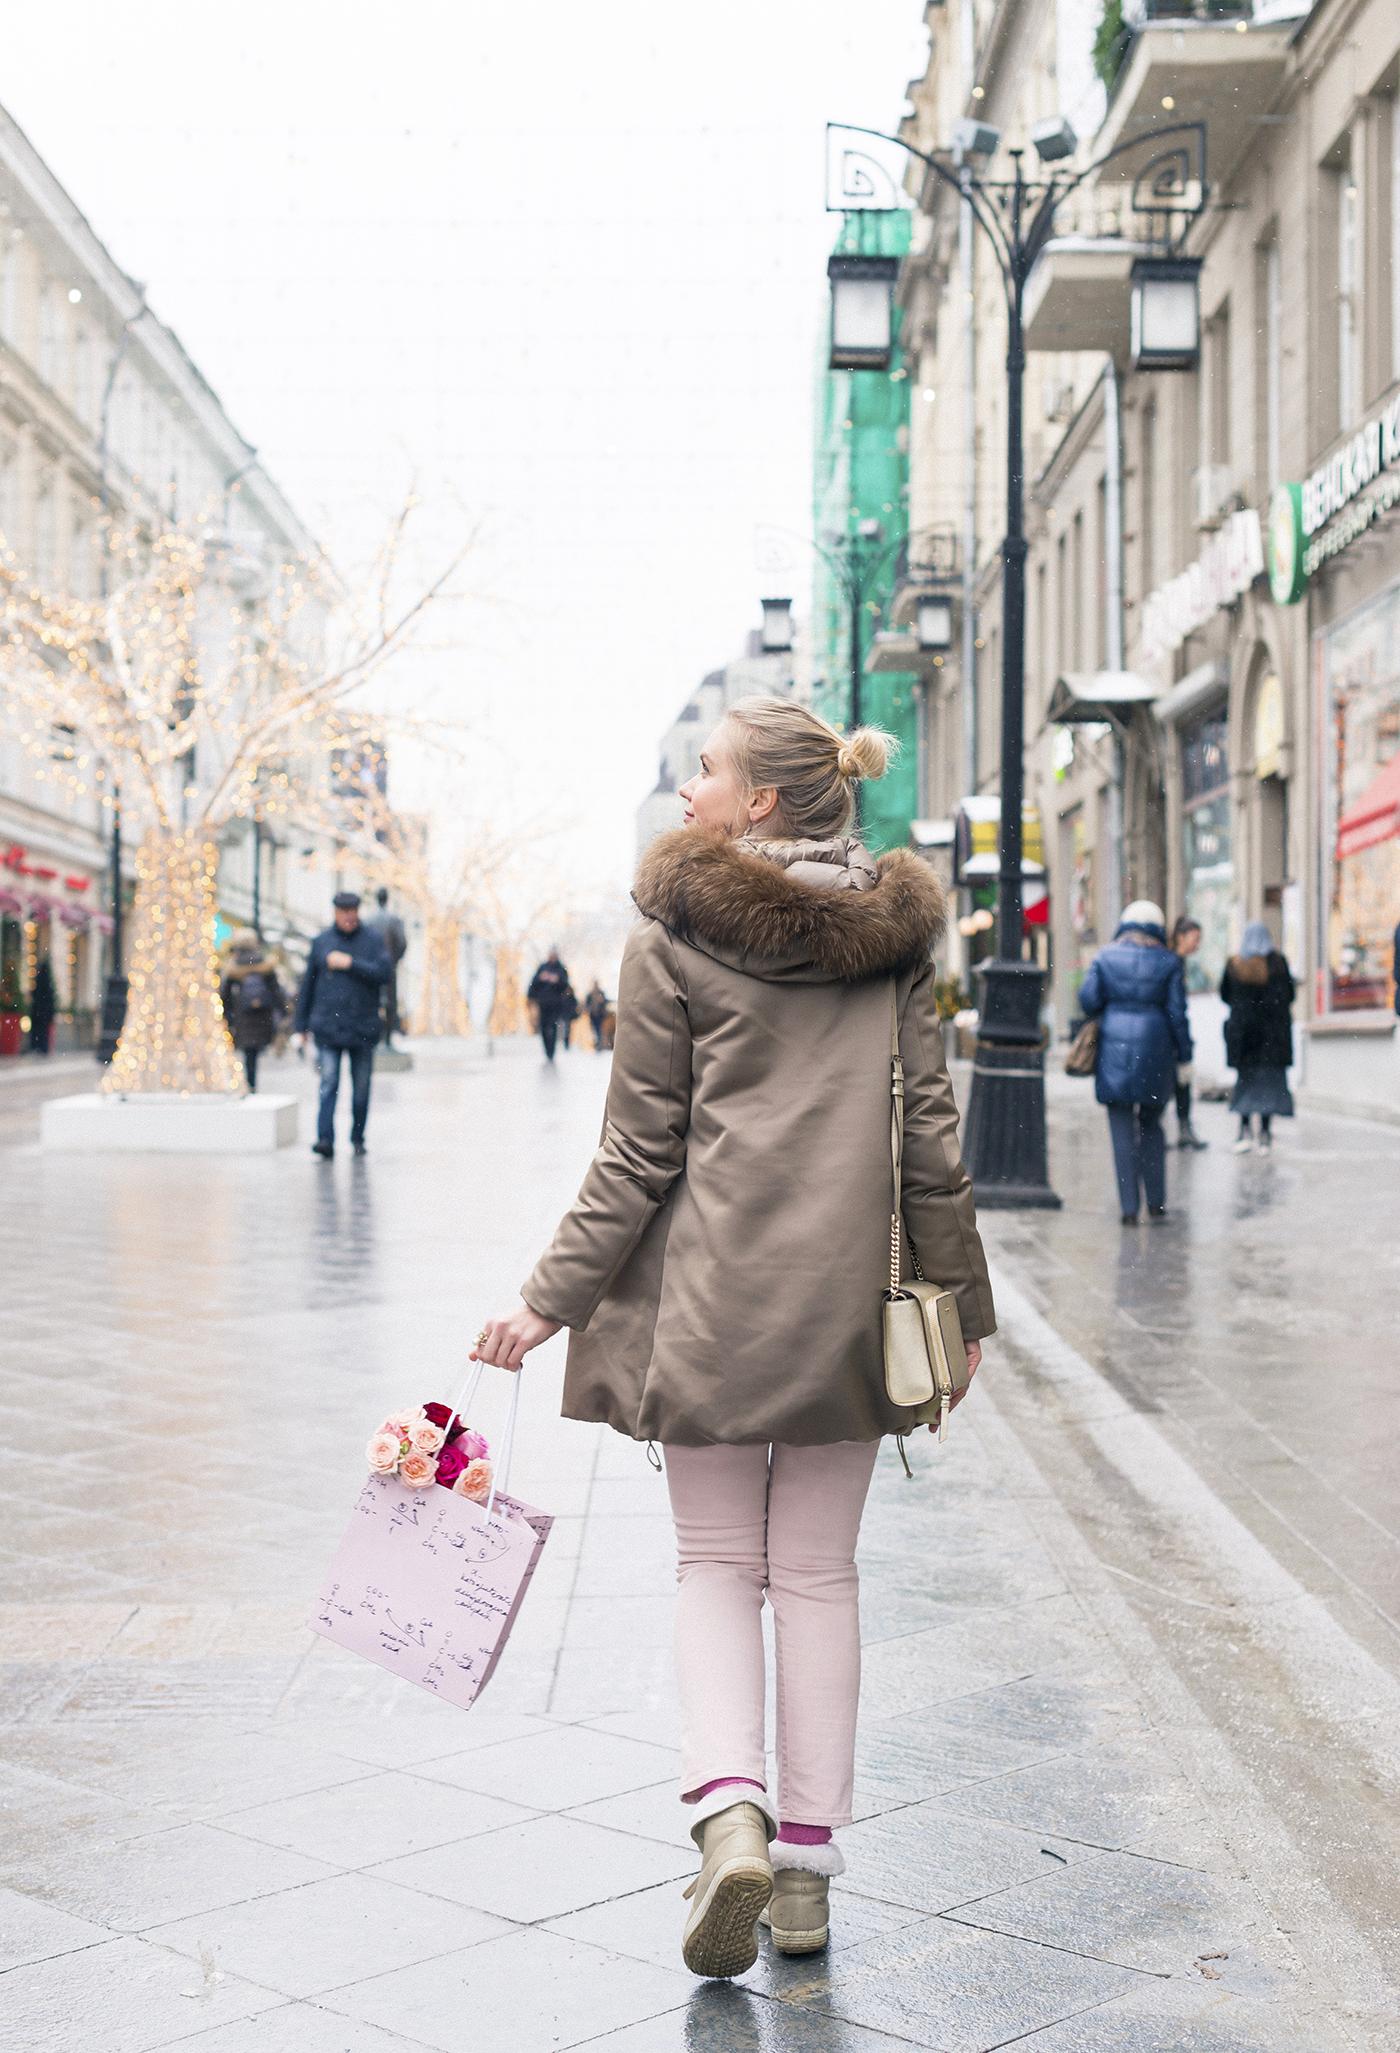 inspiration, streetstyle, winter outfit, annamidday, top fashion blogger, top russian fashion blogger, фэшн блогер, русский блогер, известный блогер, топовый блогер, russian bloger, top russian blogger, streetfashion, russian fashion blogger, blogger, fashion, style, fashionista, модный блогер, российский блогер, ТОП блогер, ootd, lookoftheday, look, популярный блогер, российский модный блогер, russian girl, с чем носить пуховик, pastel outfir, pastel downcoat, downcoat streetstyle, пастельные цвета, цветовые сочетания, streetstyle, красивая девушка, Анна миддэй, анна мидэй, DKNY golden bag, crown australia boots, pink sweater, russian winter, bon prix sweater